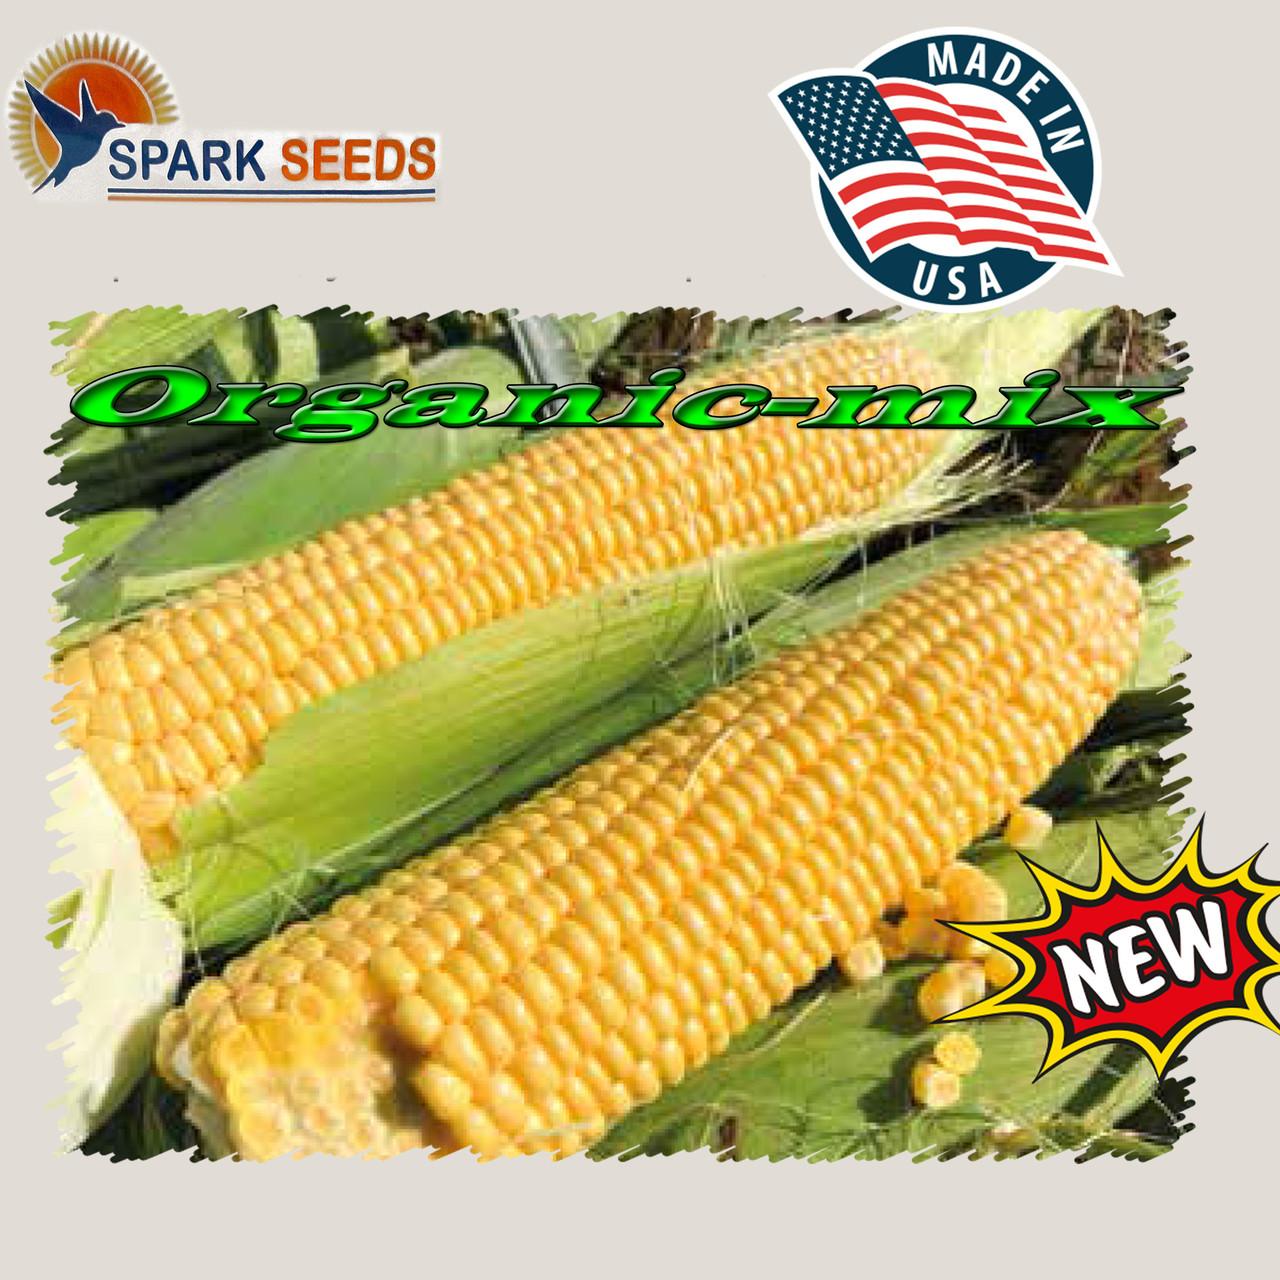 Ранняя, сверхмощная сахарная кукуруза 1801 F1 (США), фермерская упаковка (2500 семян)